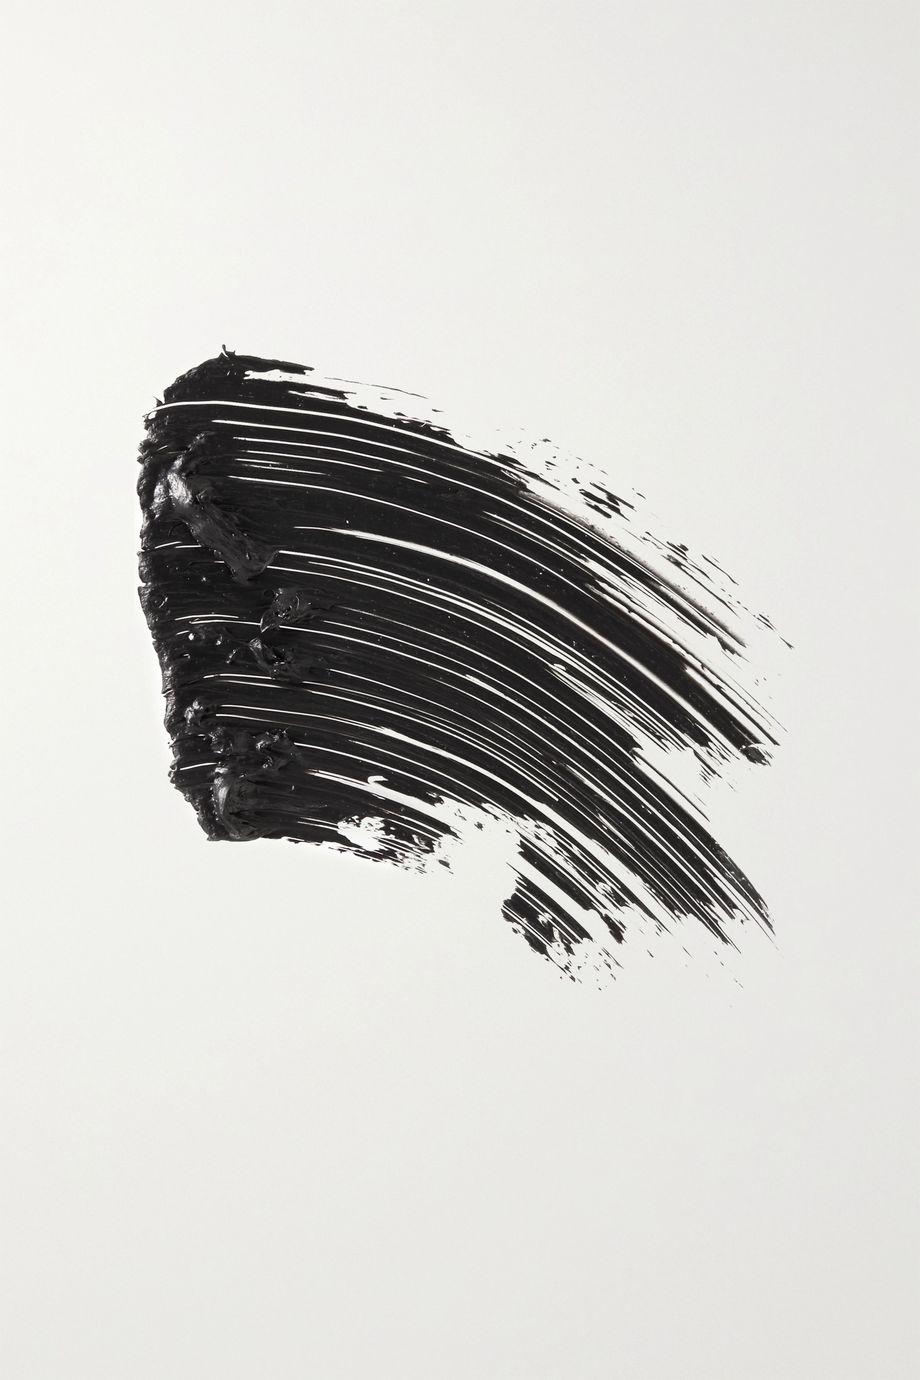 Charlotte Tilbury Legendary Lashes Mascara - Glossy Black